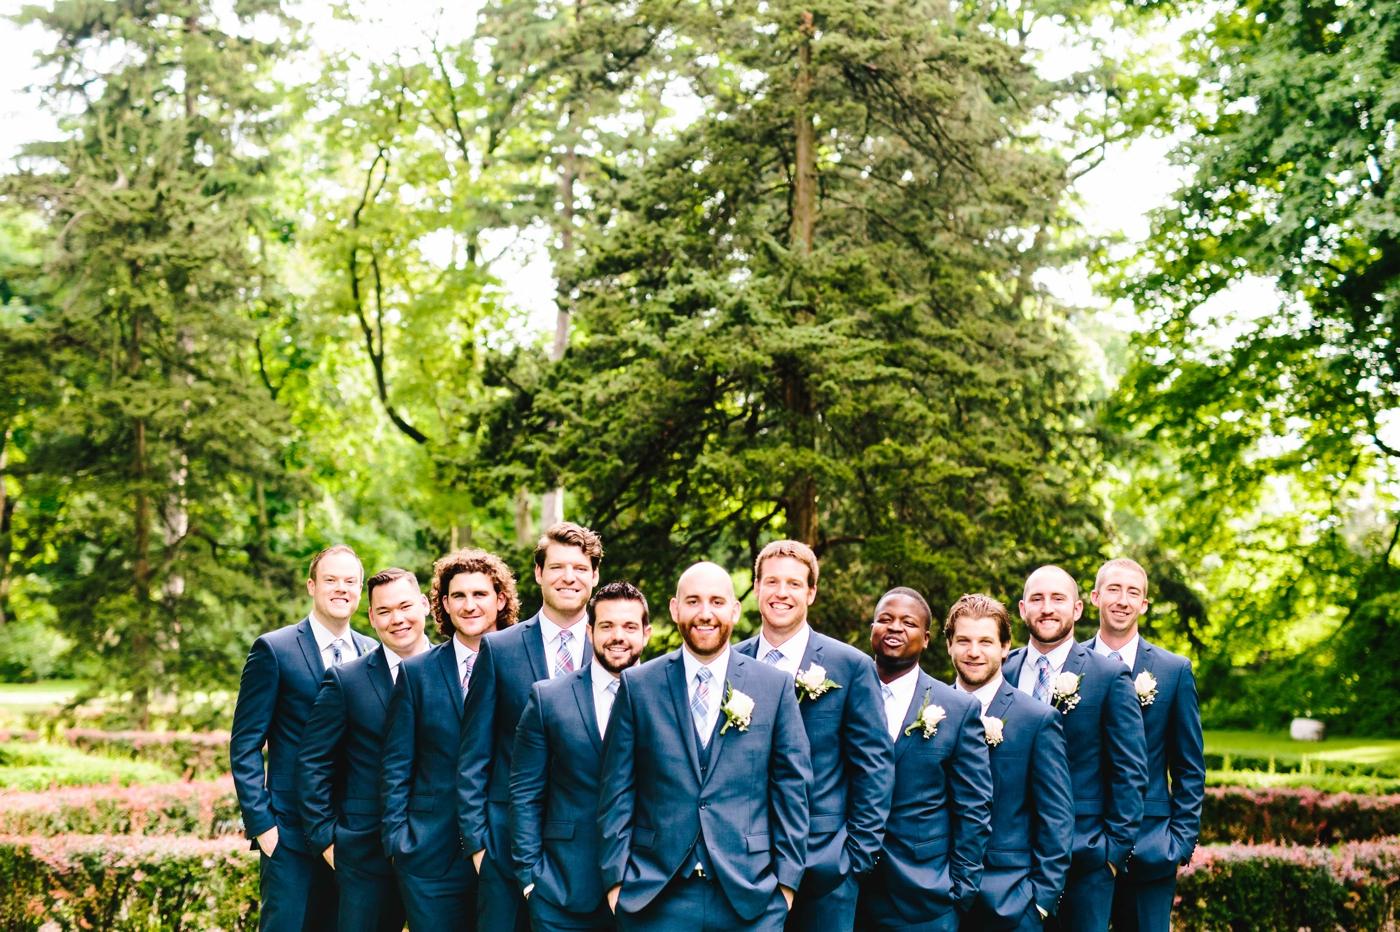 chicago-fine-art-wedding-photography-svihra10